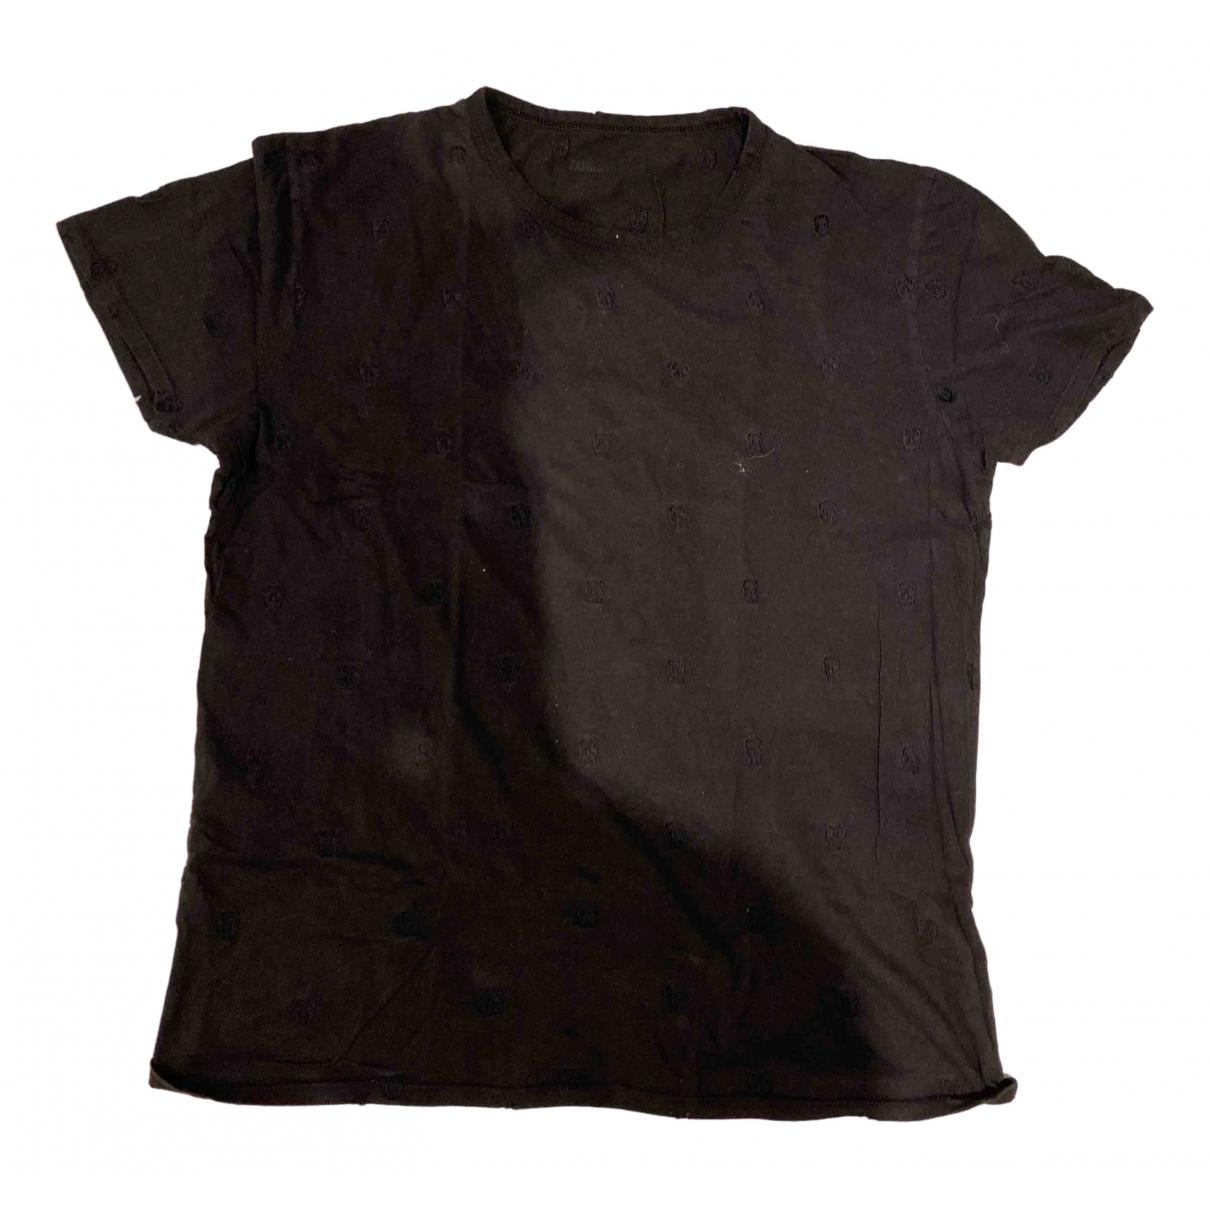 Zadig & Voltaire \N Black Cotton T-shirts for Men S International